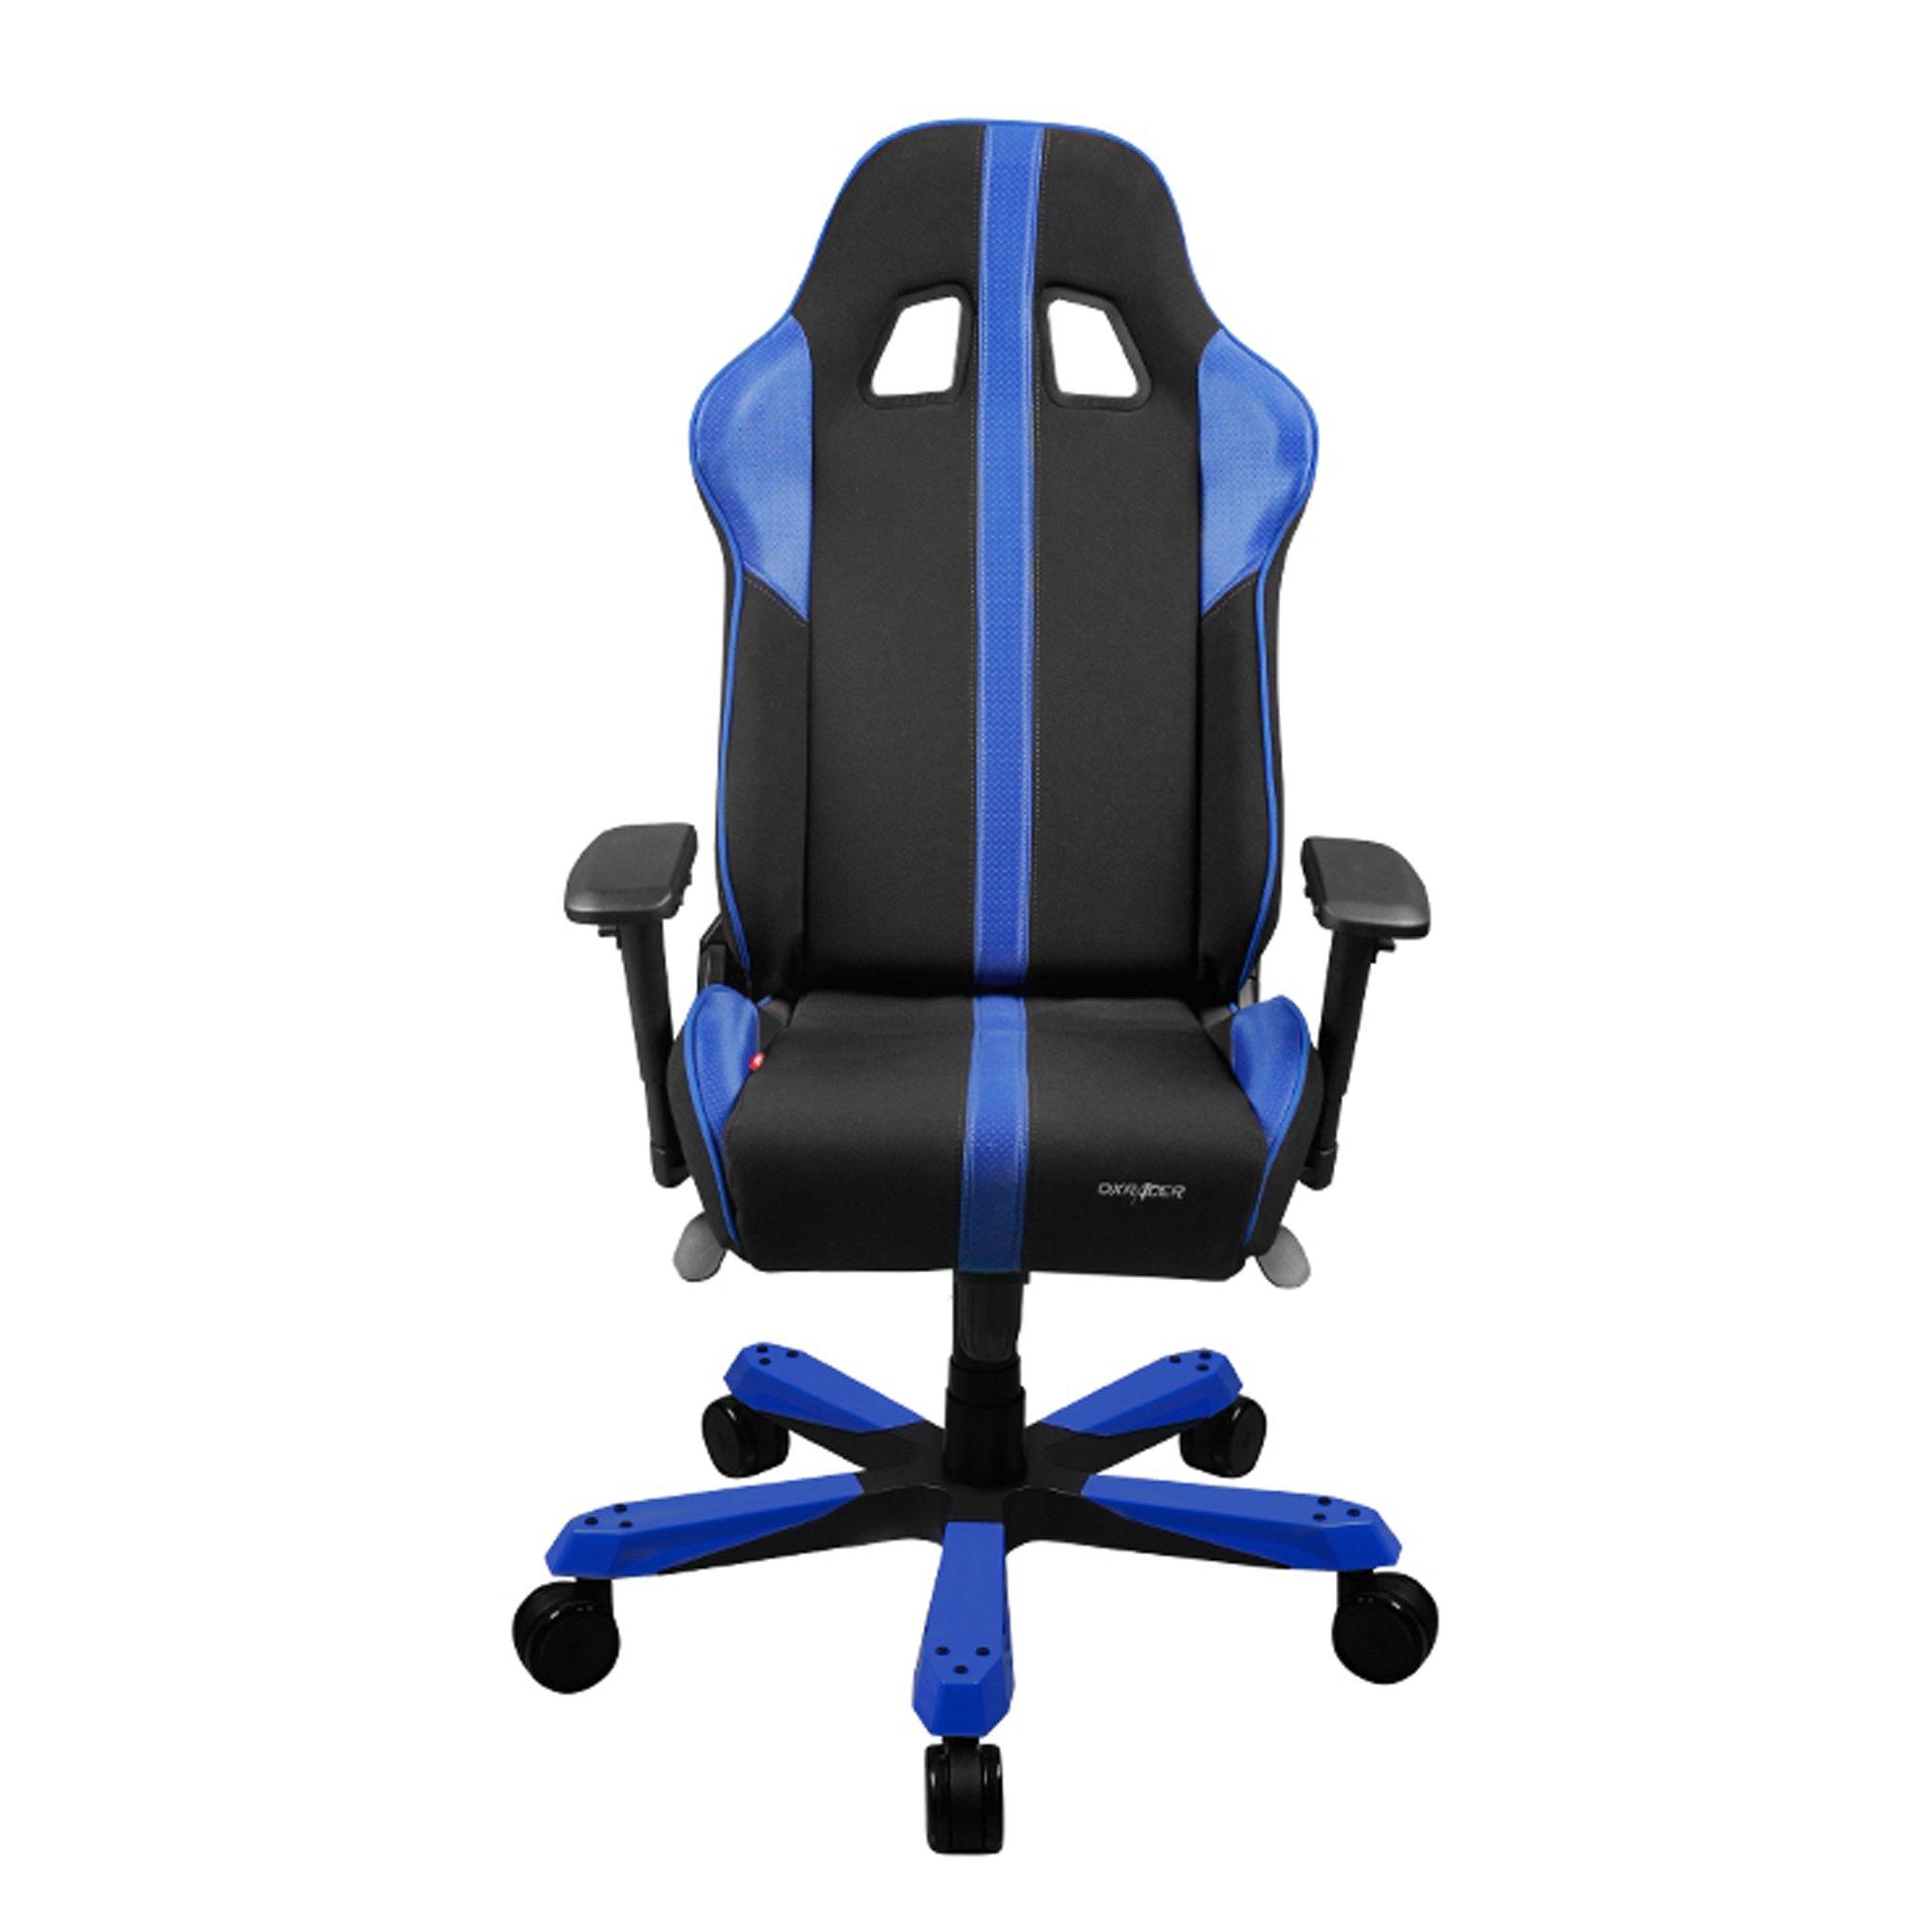 dxracer chair accessories spotlight loose covers galleon kf91 nb black blue king series racing